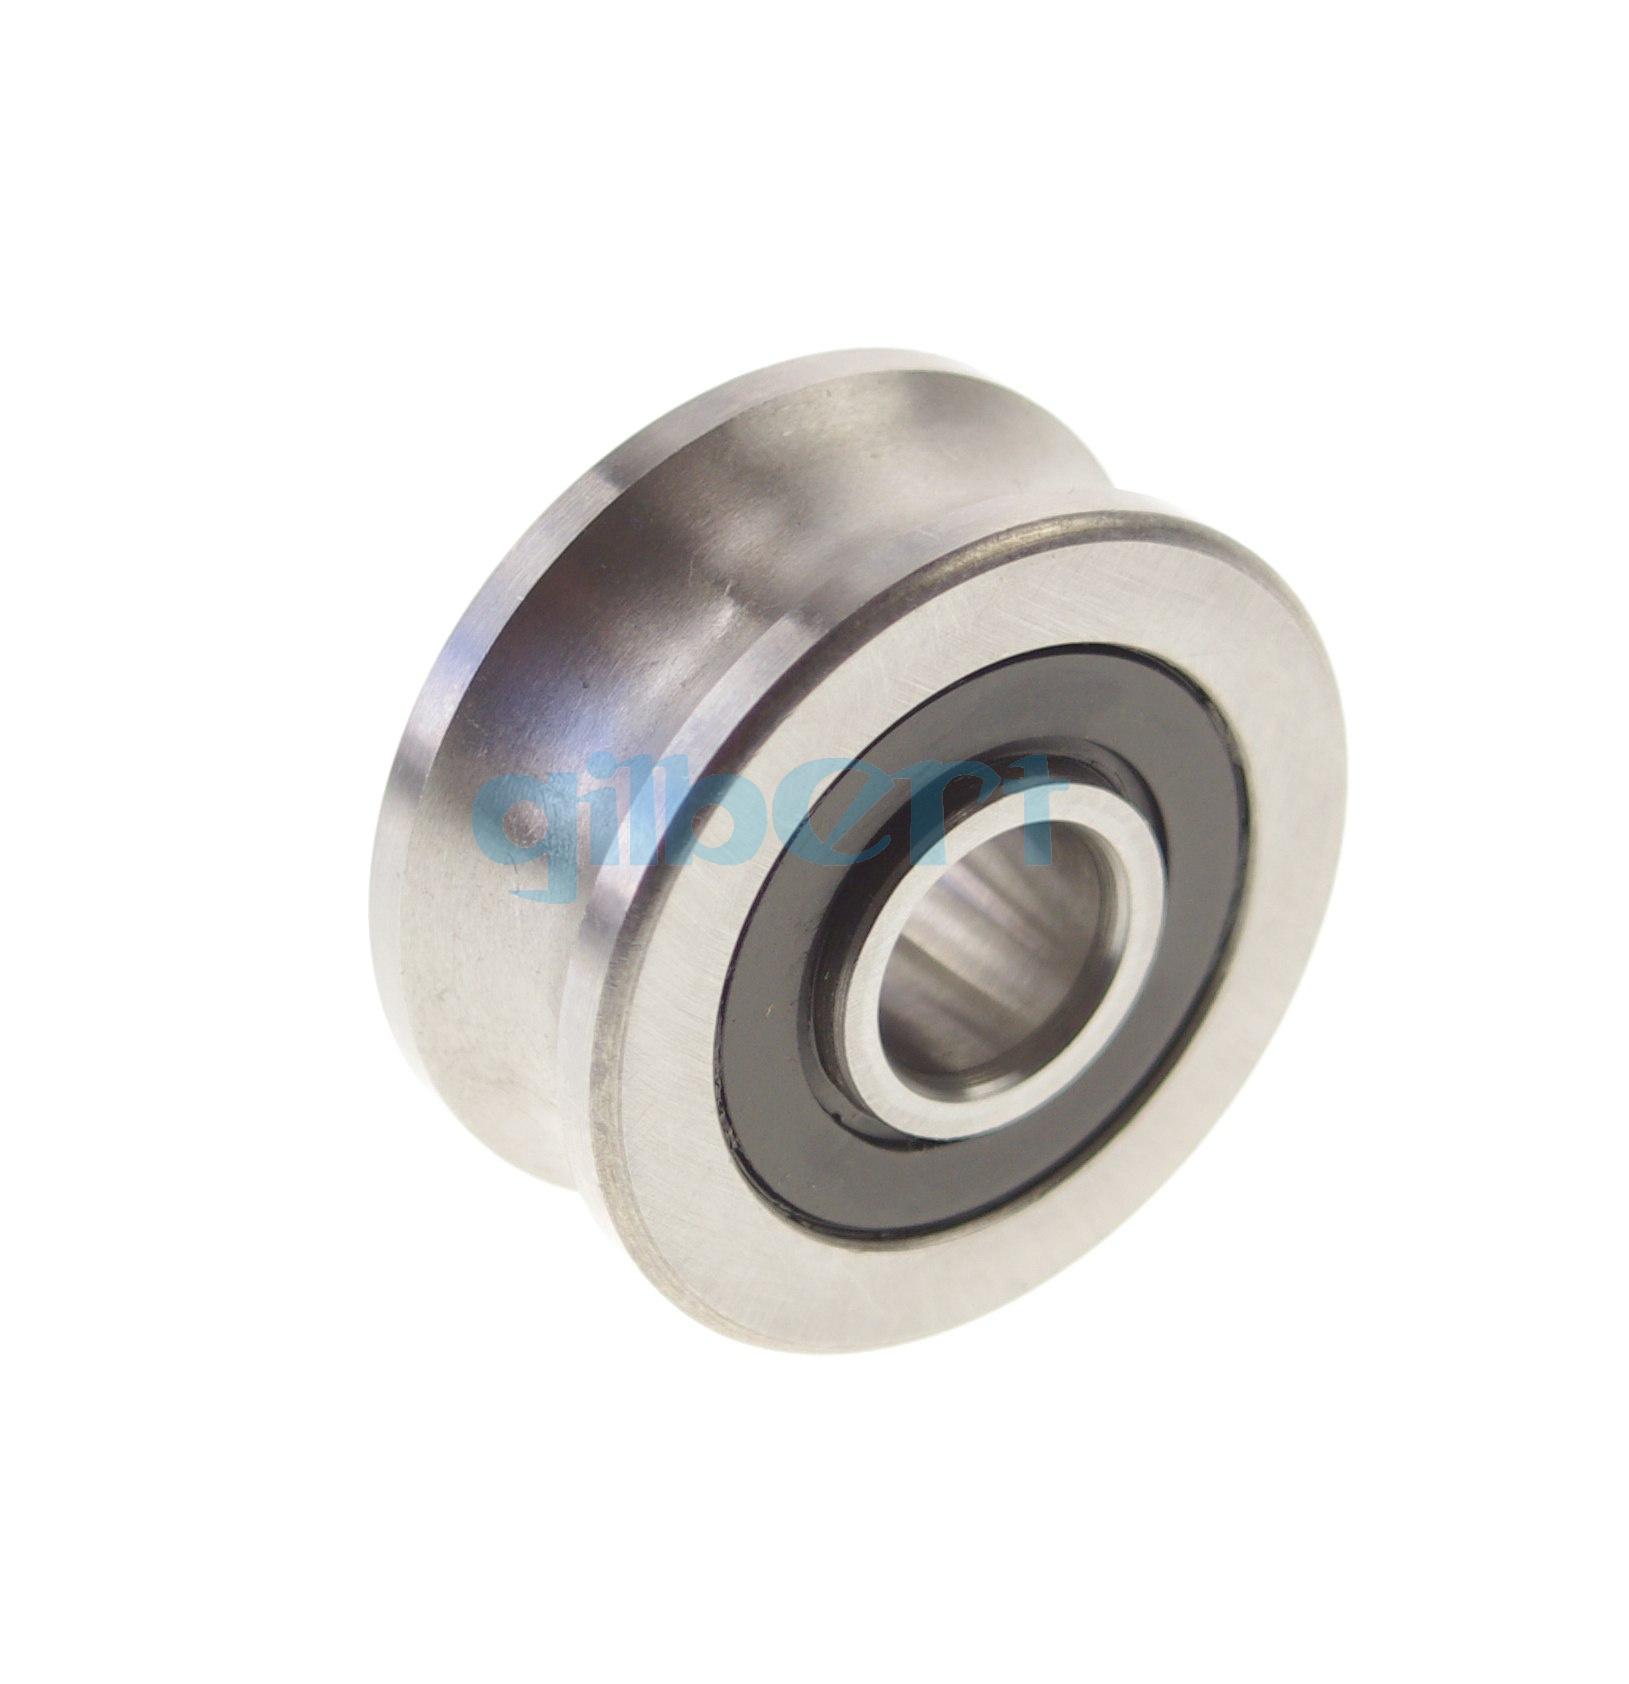 2pcs 12*39.9*18mm U Groove width 11.5mm Guide Pulley Sheave Sealed Rail Bearing